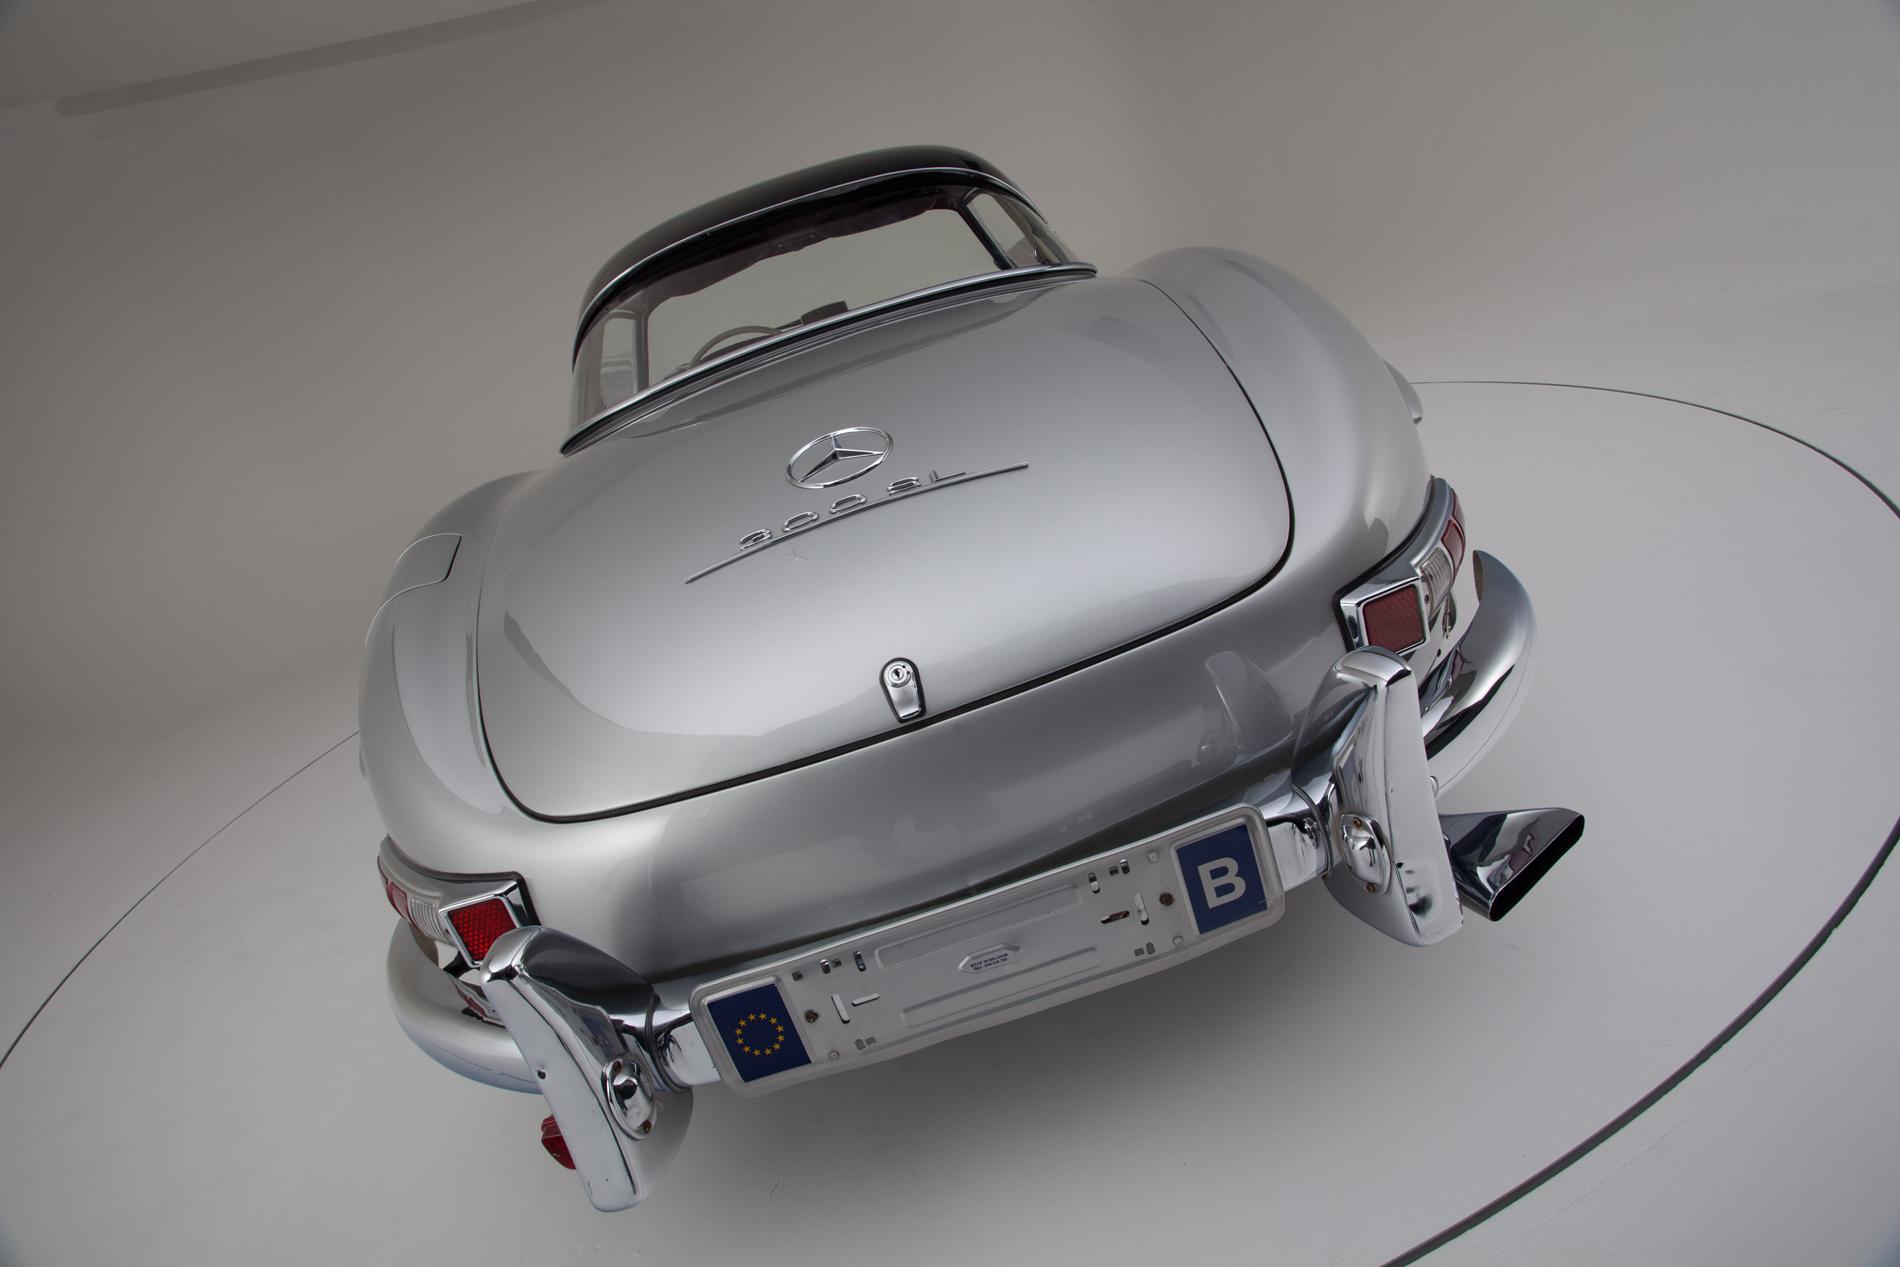 Silver Mercedes-Benz 300SL Roadster in the Hemmels showroom